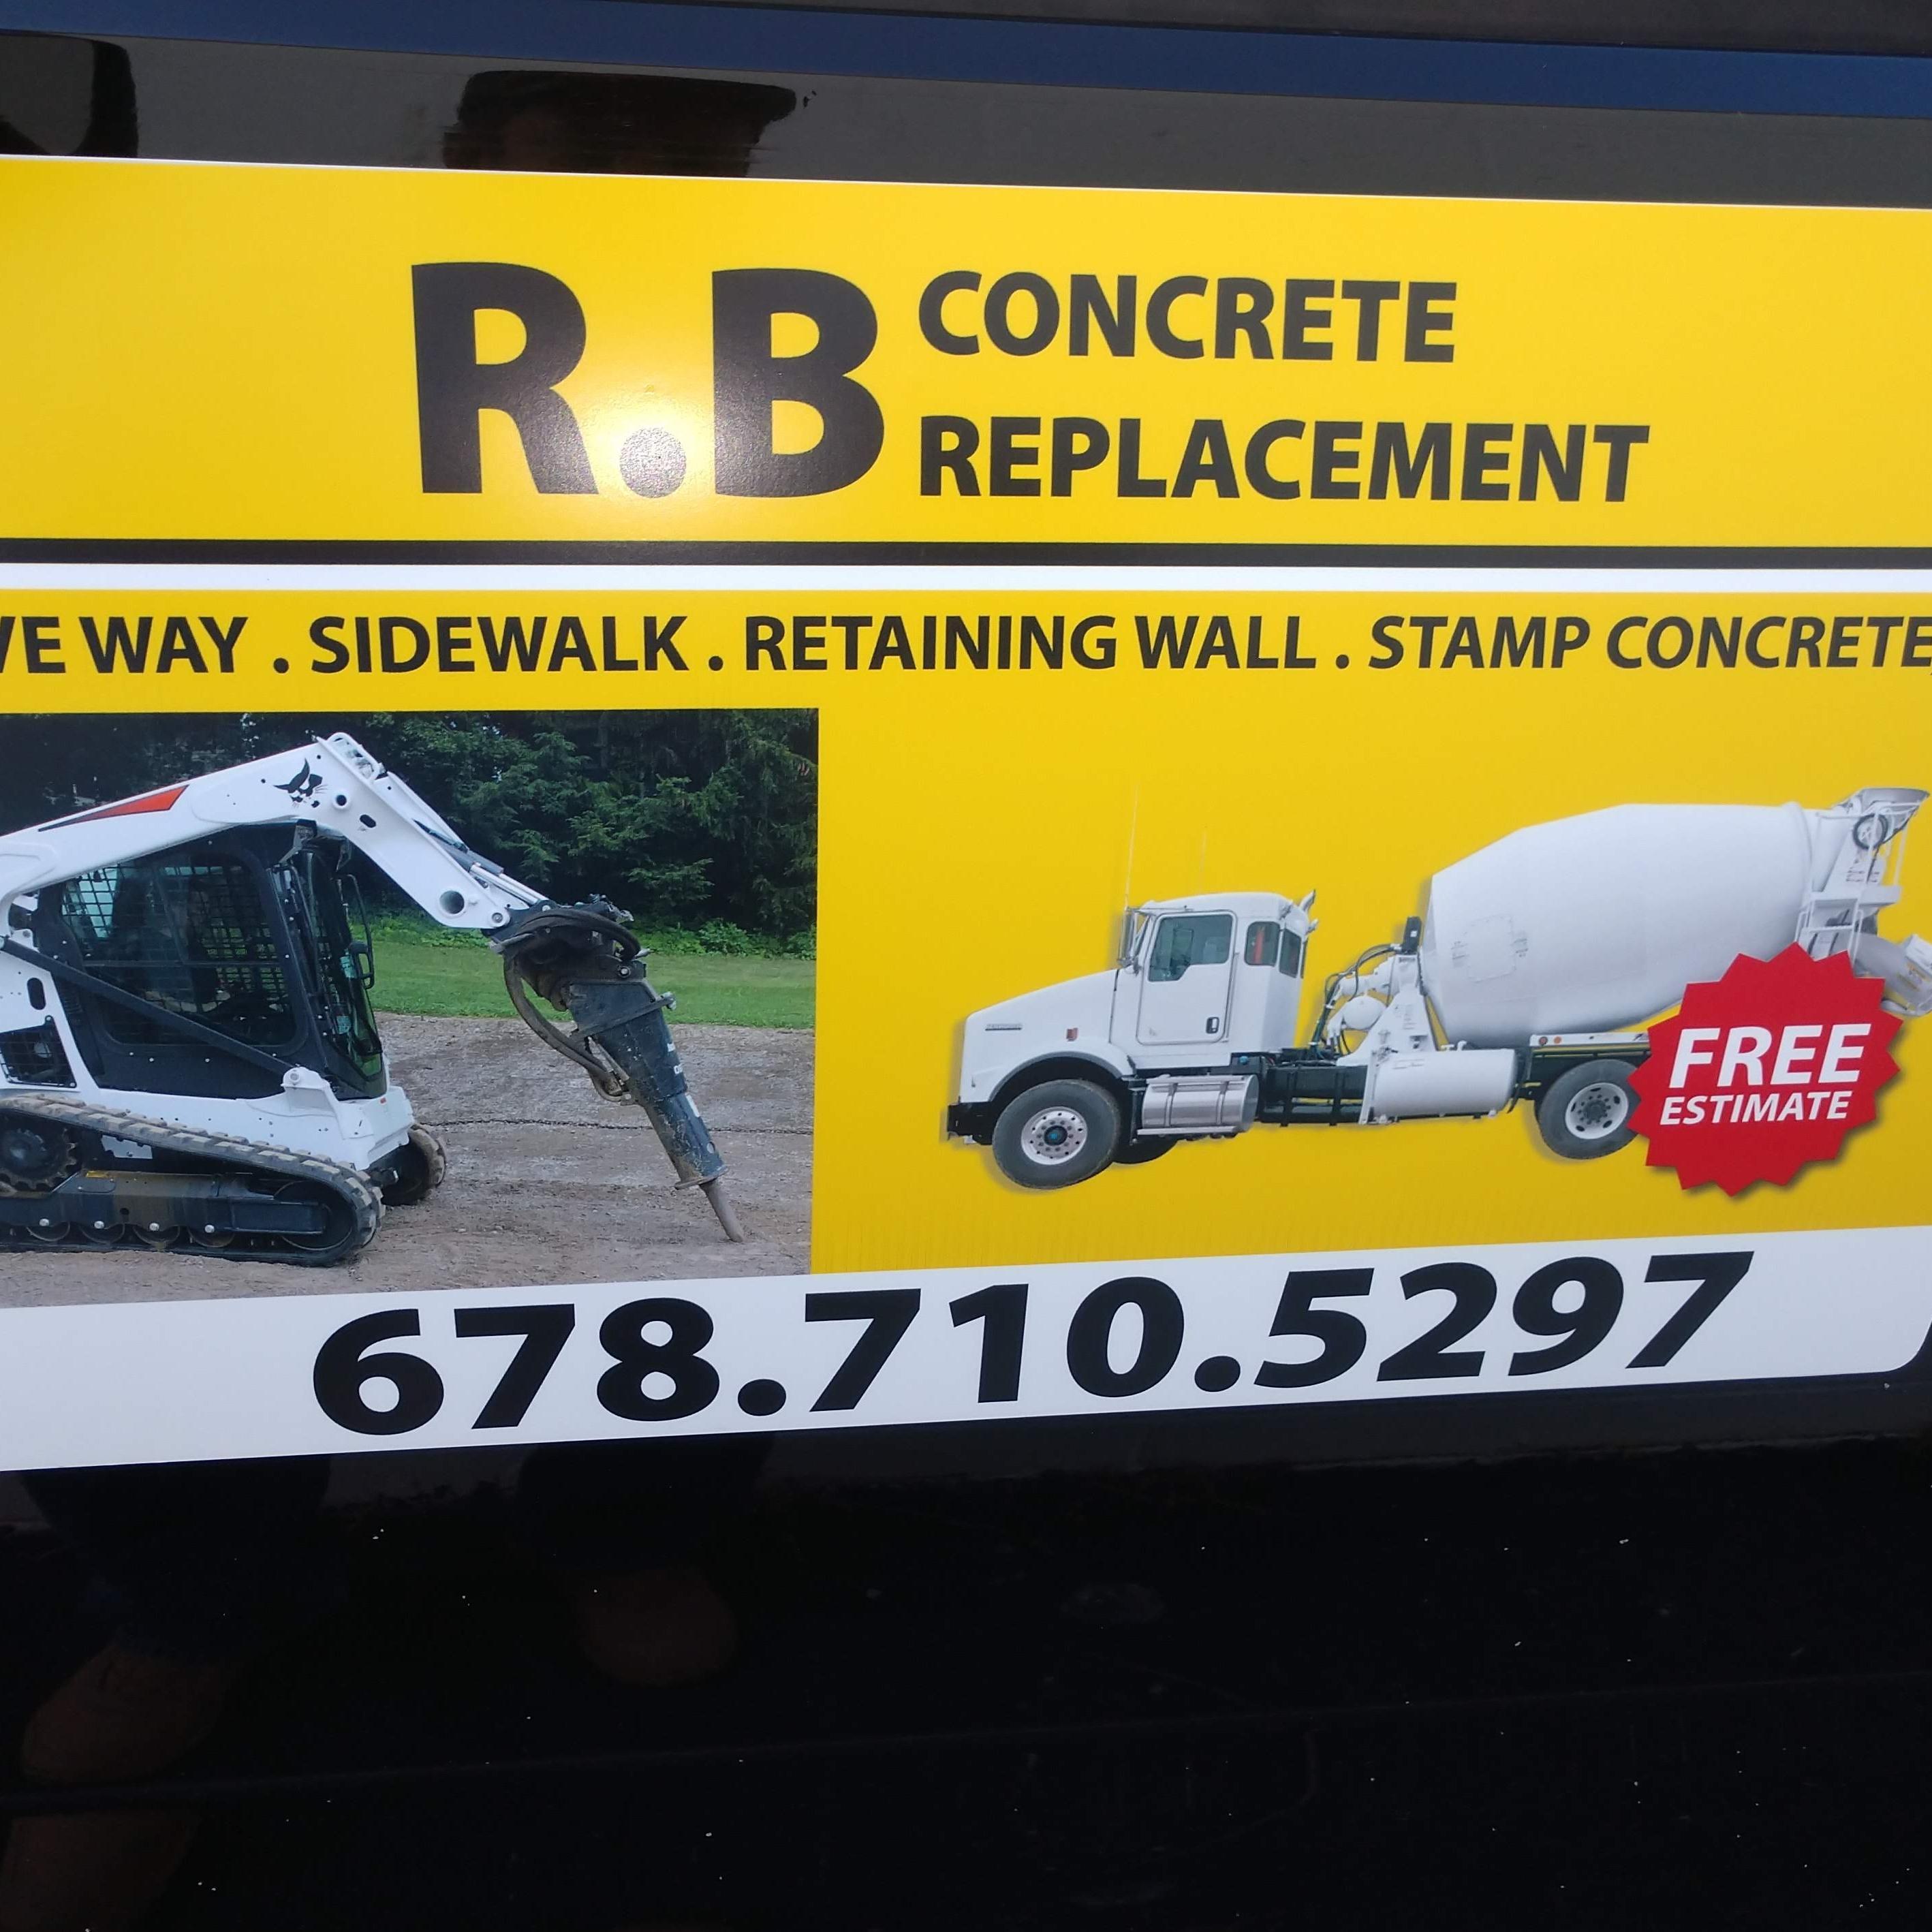 R B Concrete